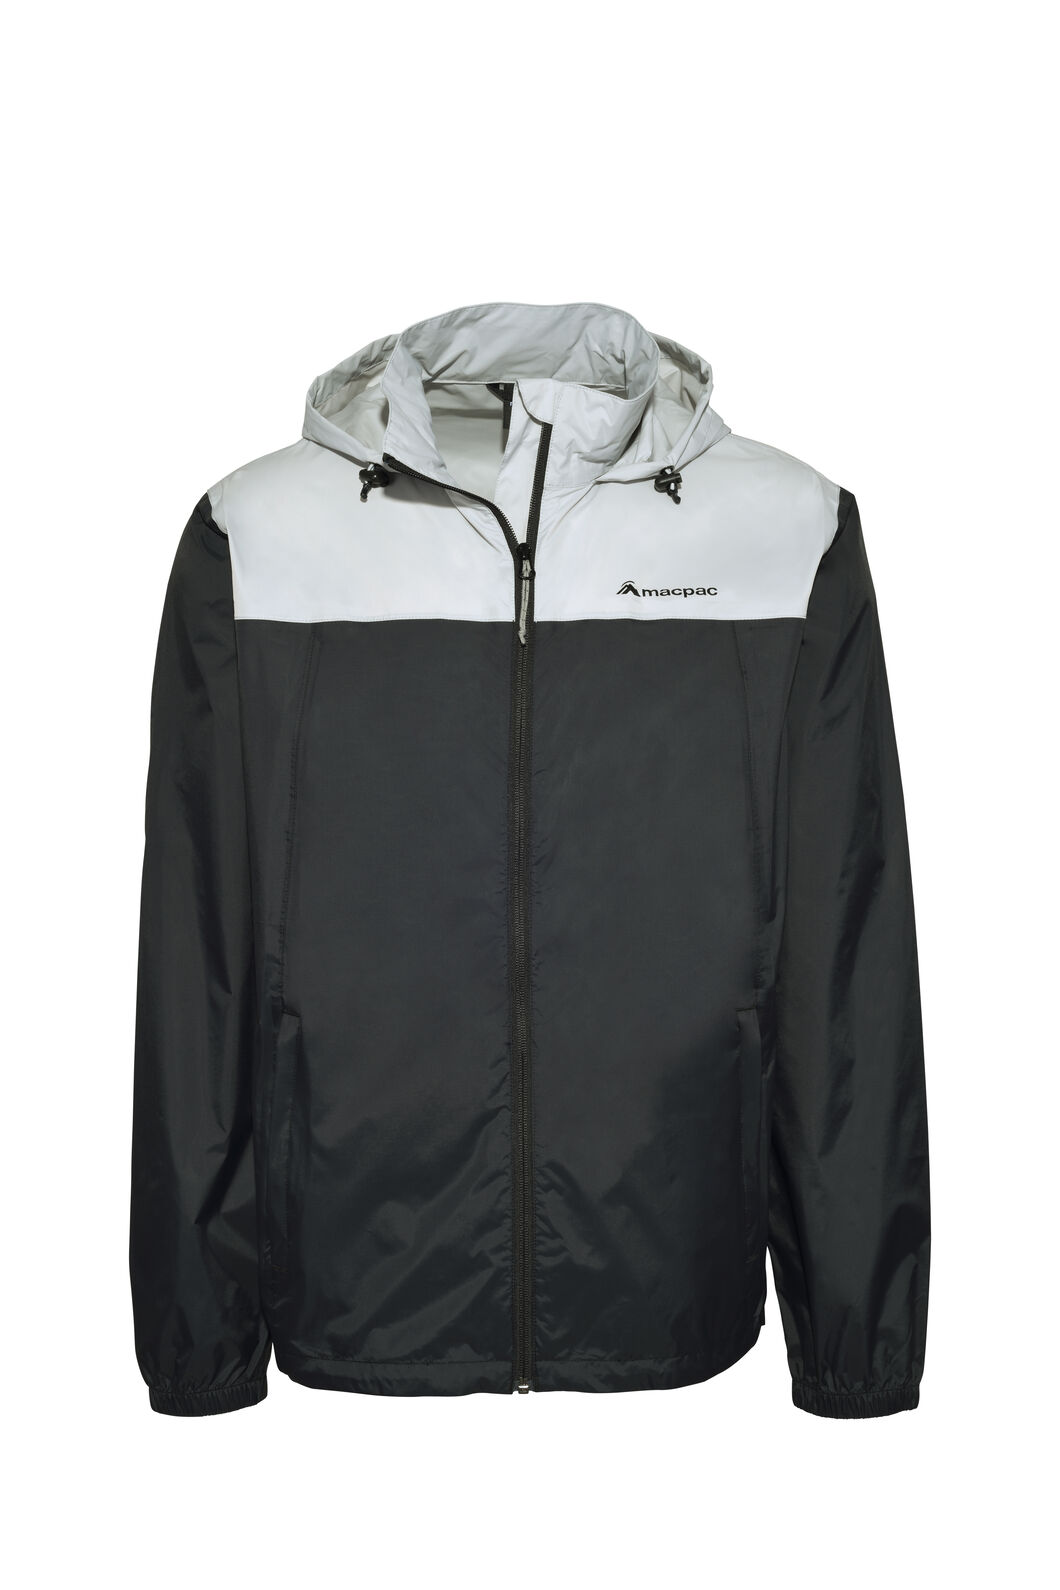 Macpac Pack-It-Jacket — Unisex, Black/High RIse, hi-res